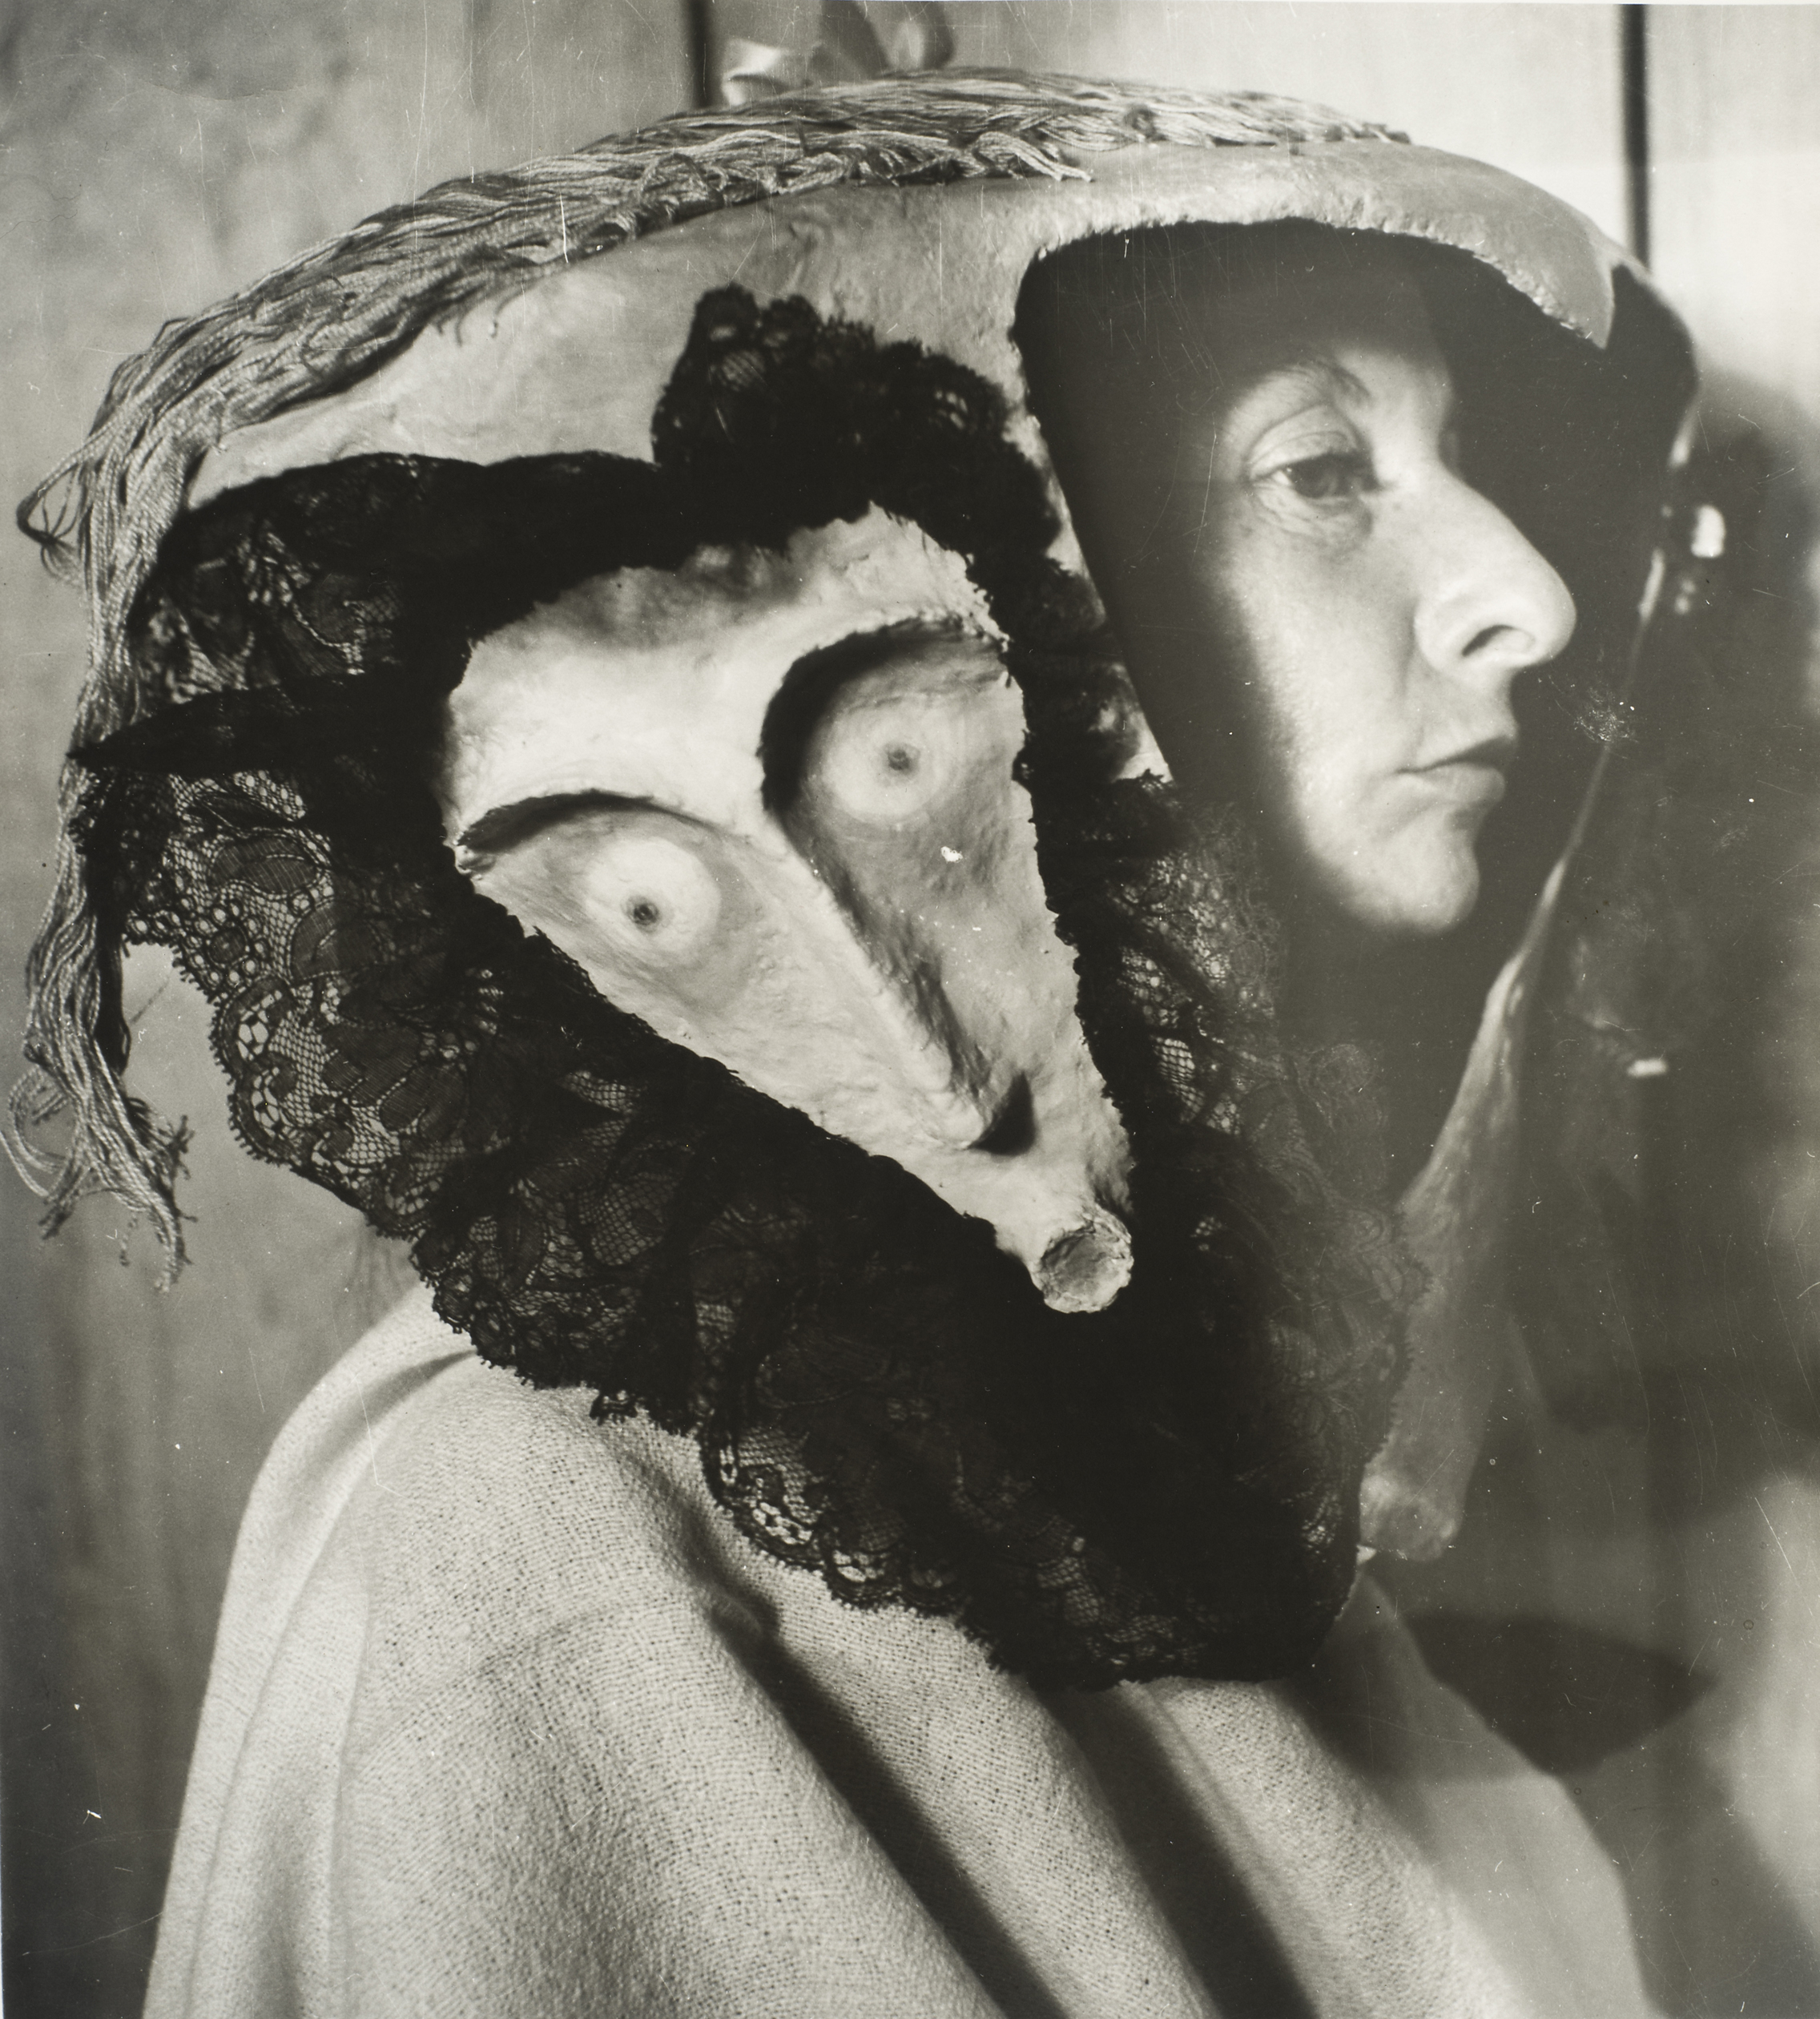 Remedios Varo, Mexico, 1957